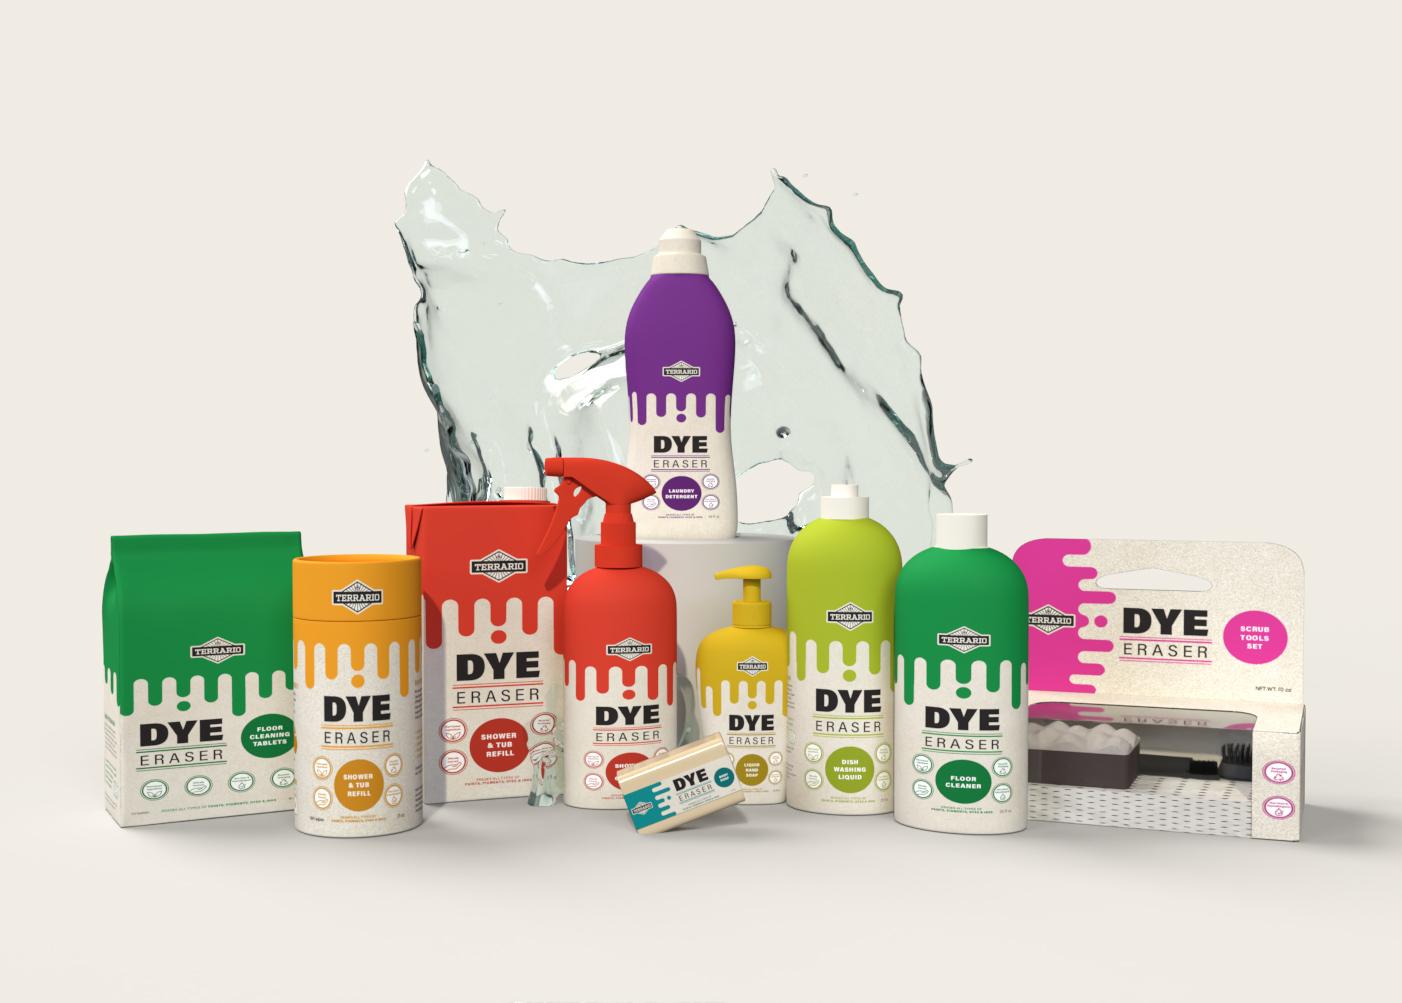 Dye Eraser Cleaning Line